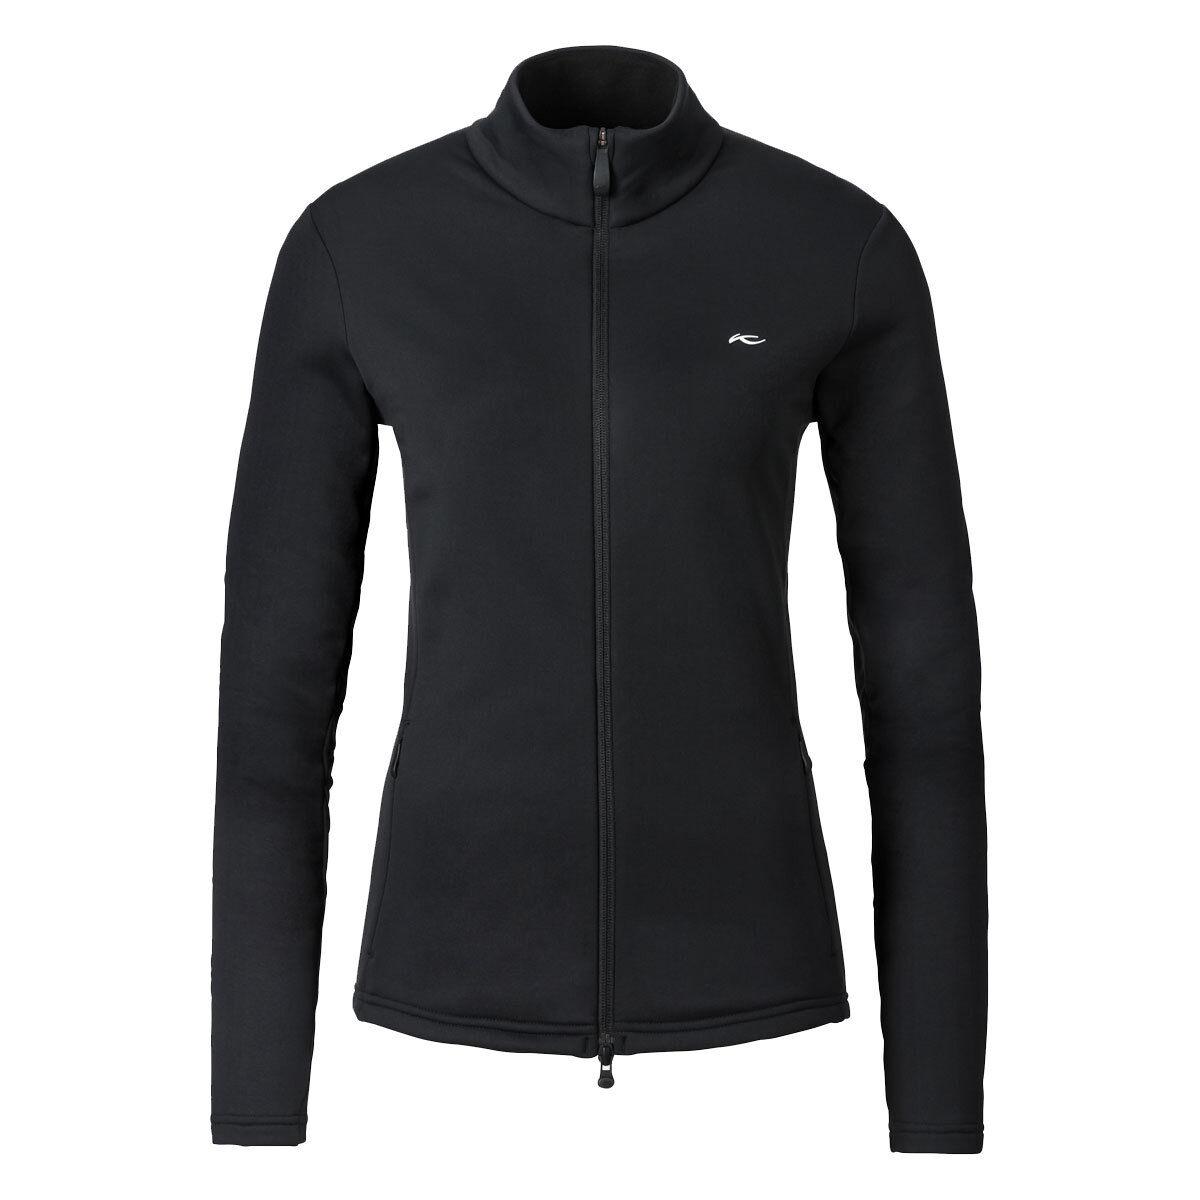 KJUS Damen Fleecejacke Midlayer Calienta Jacket MS25-A03 schwarz